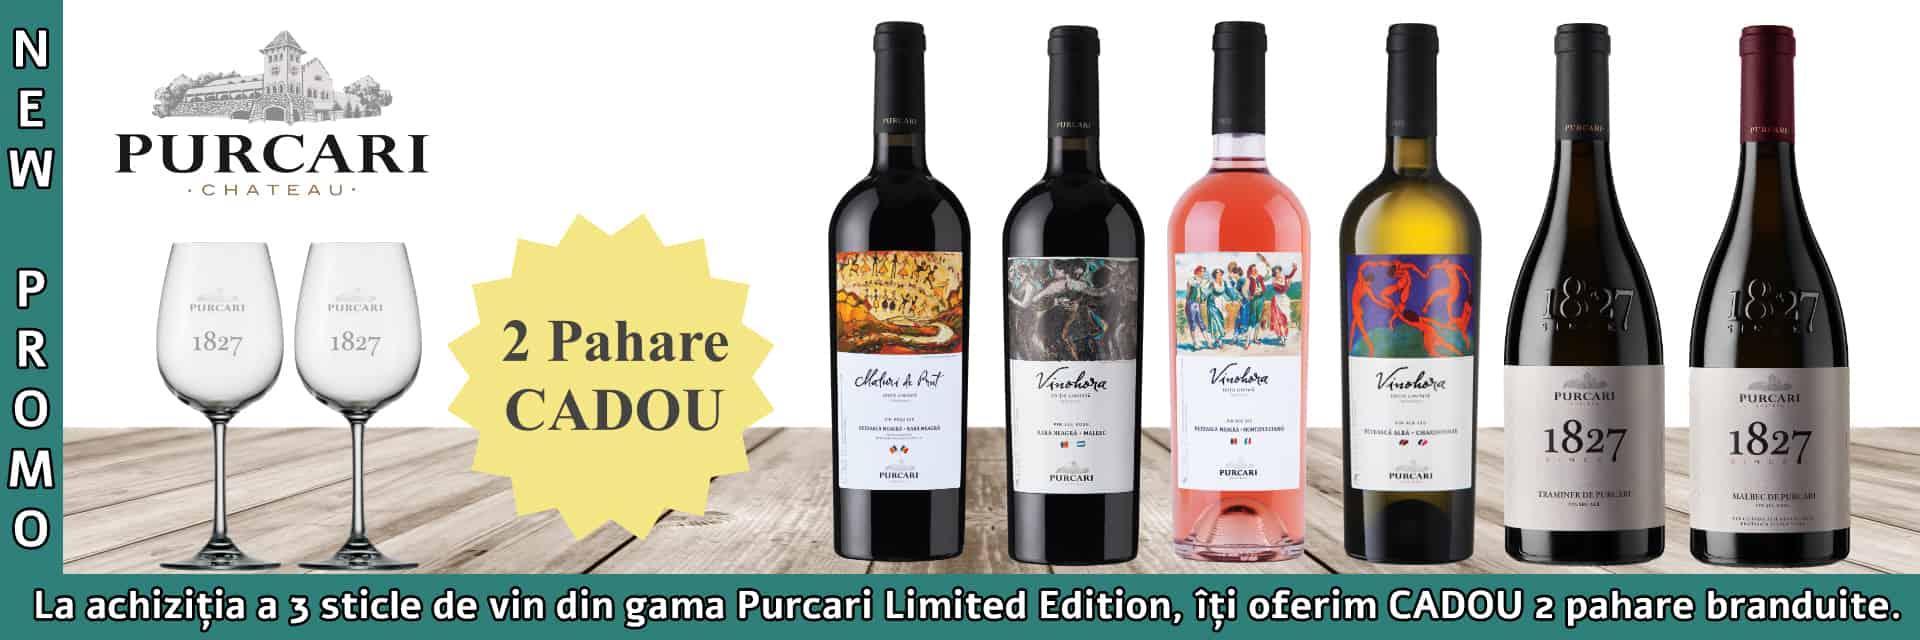 Purcari: Promo Pahare